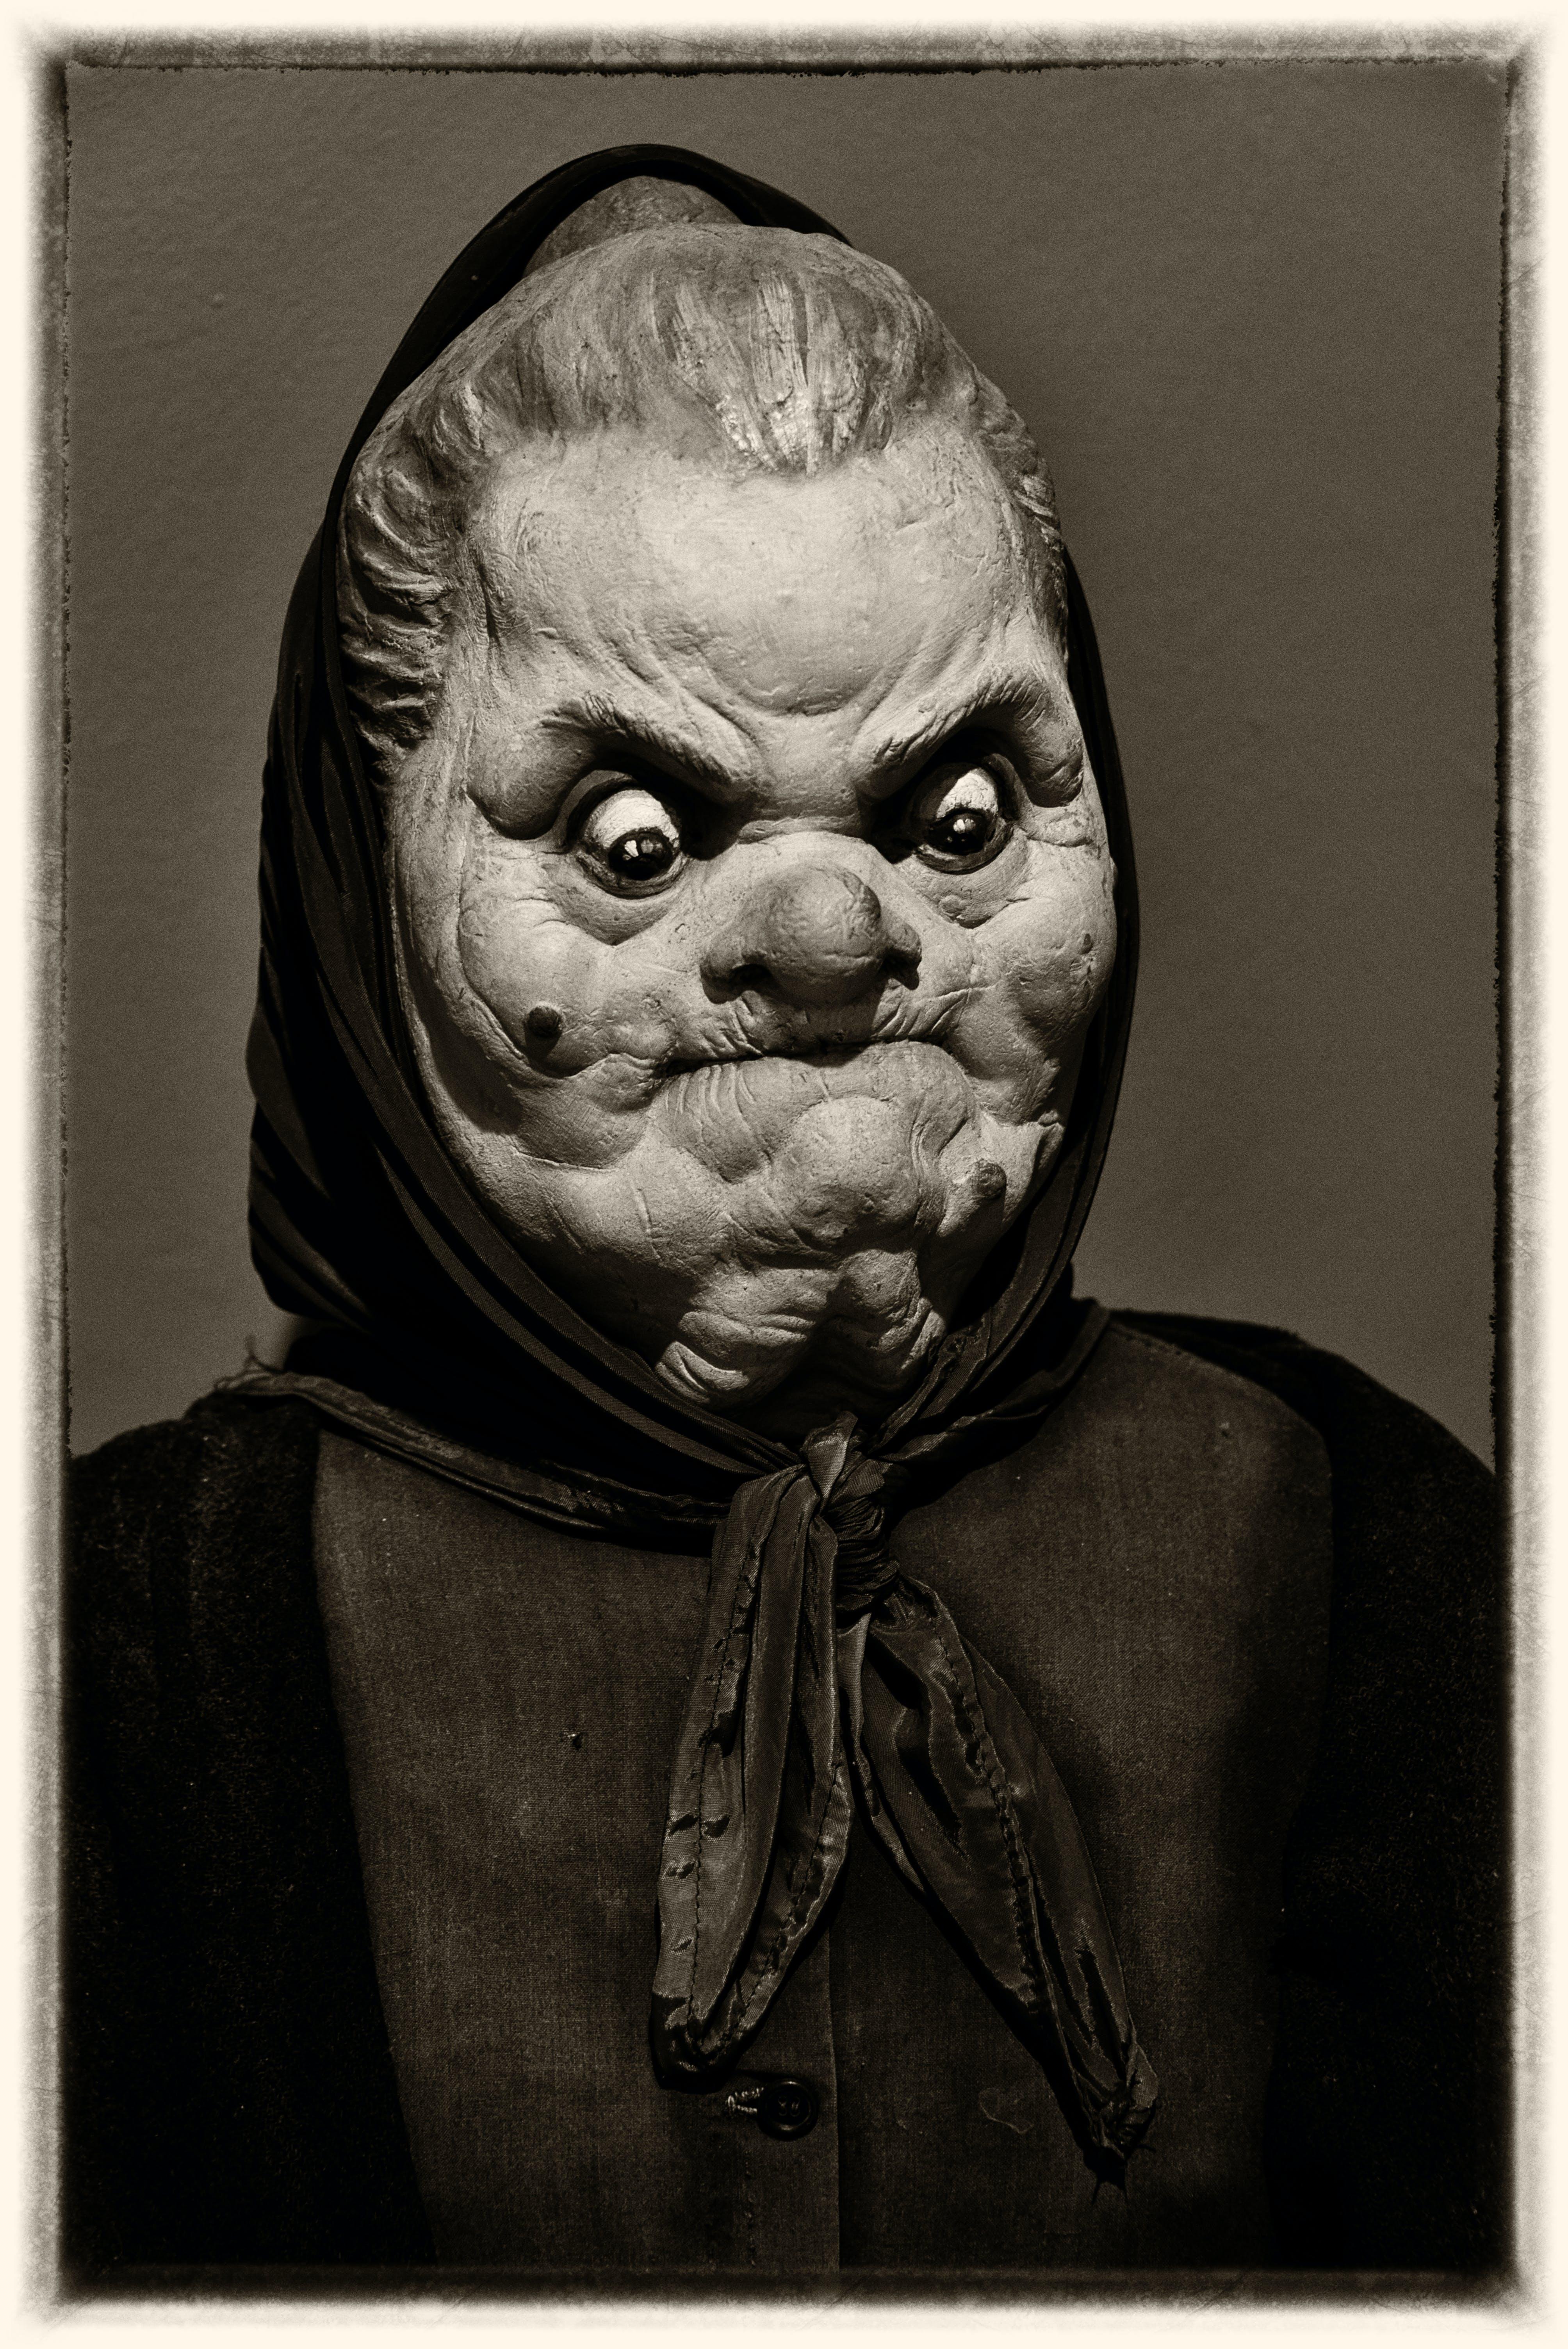 Free stock photo of funny face, manniken, granny face